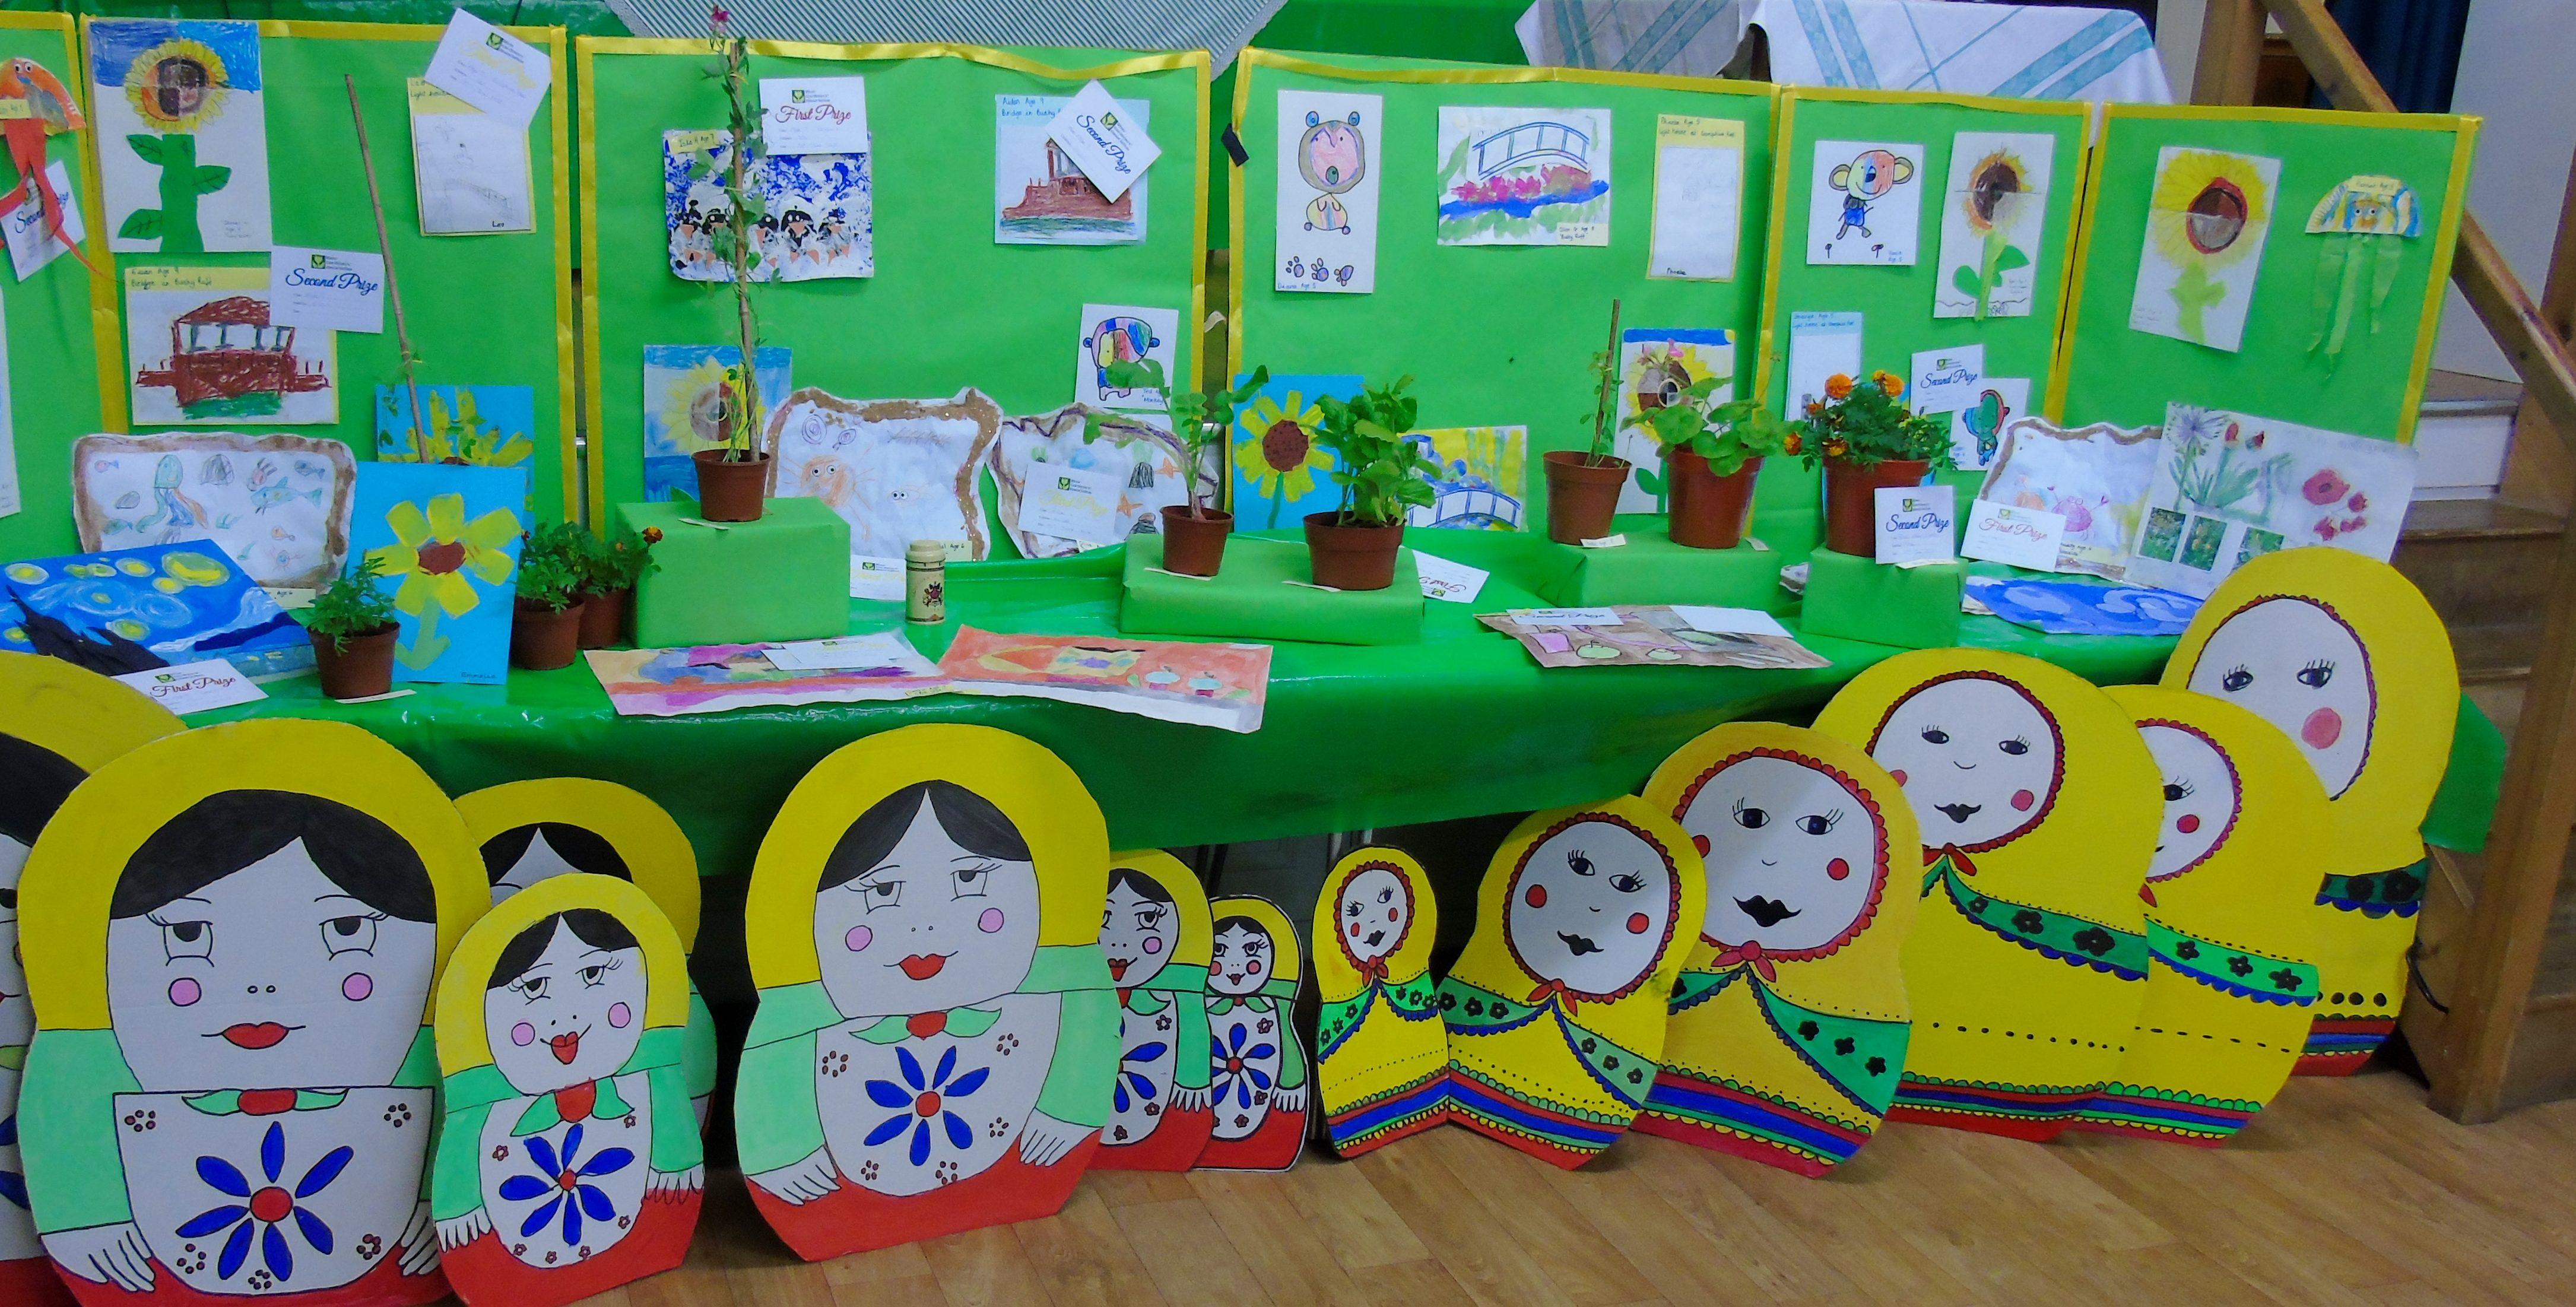 River Primary School exhibits